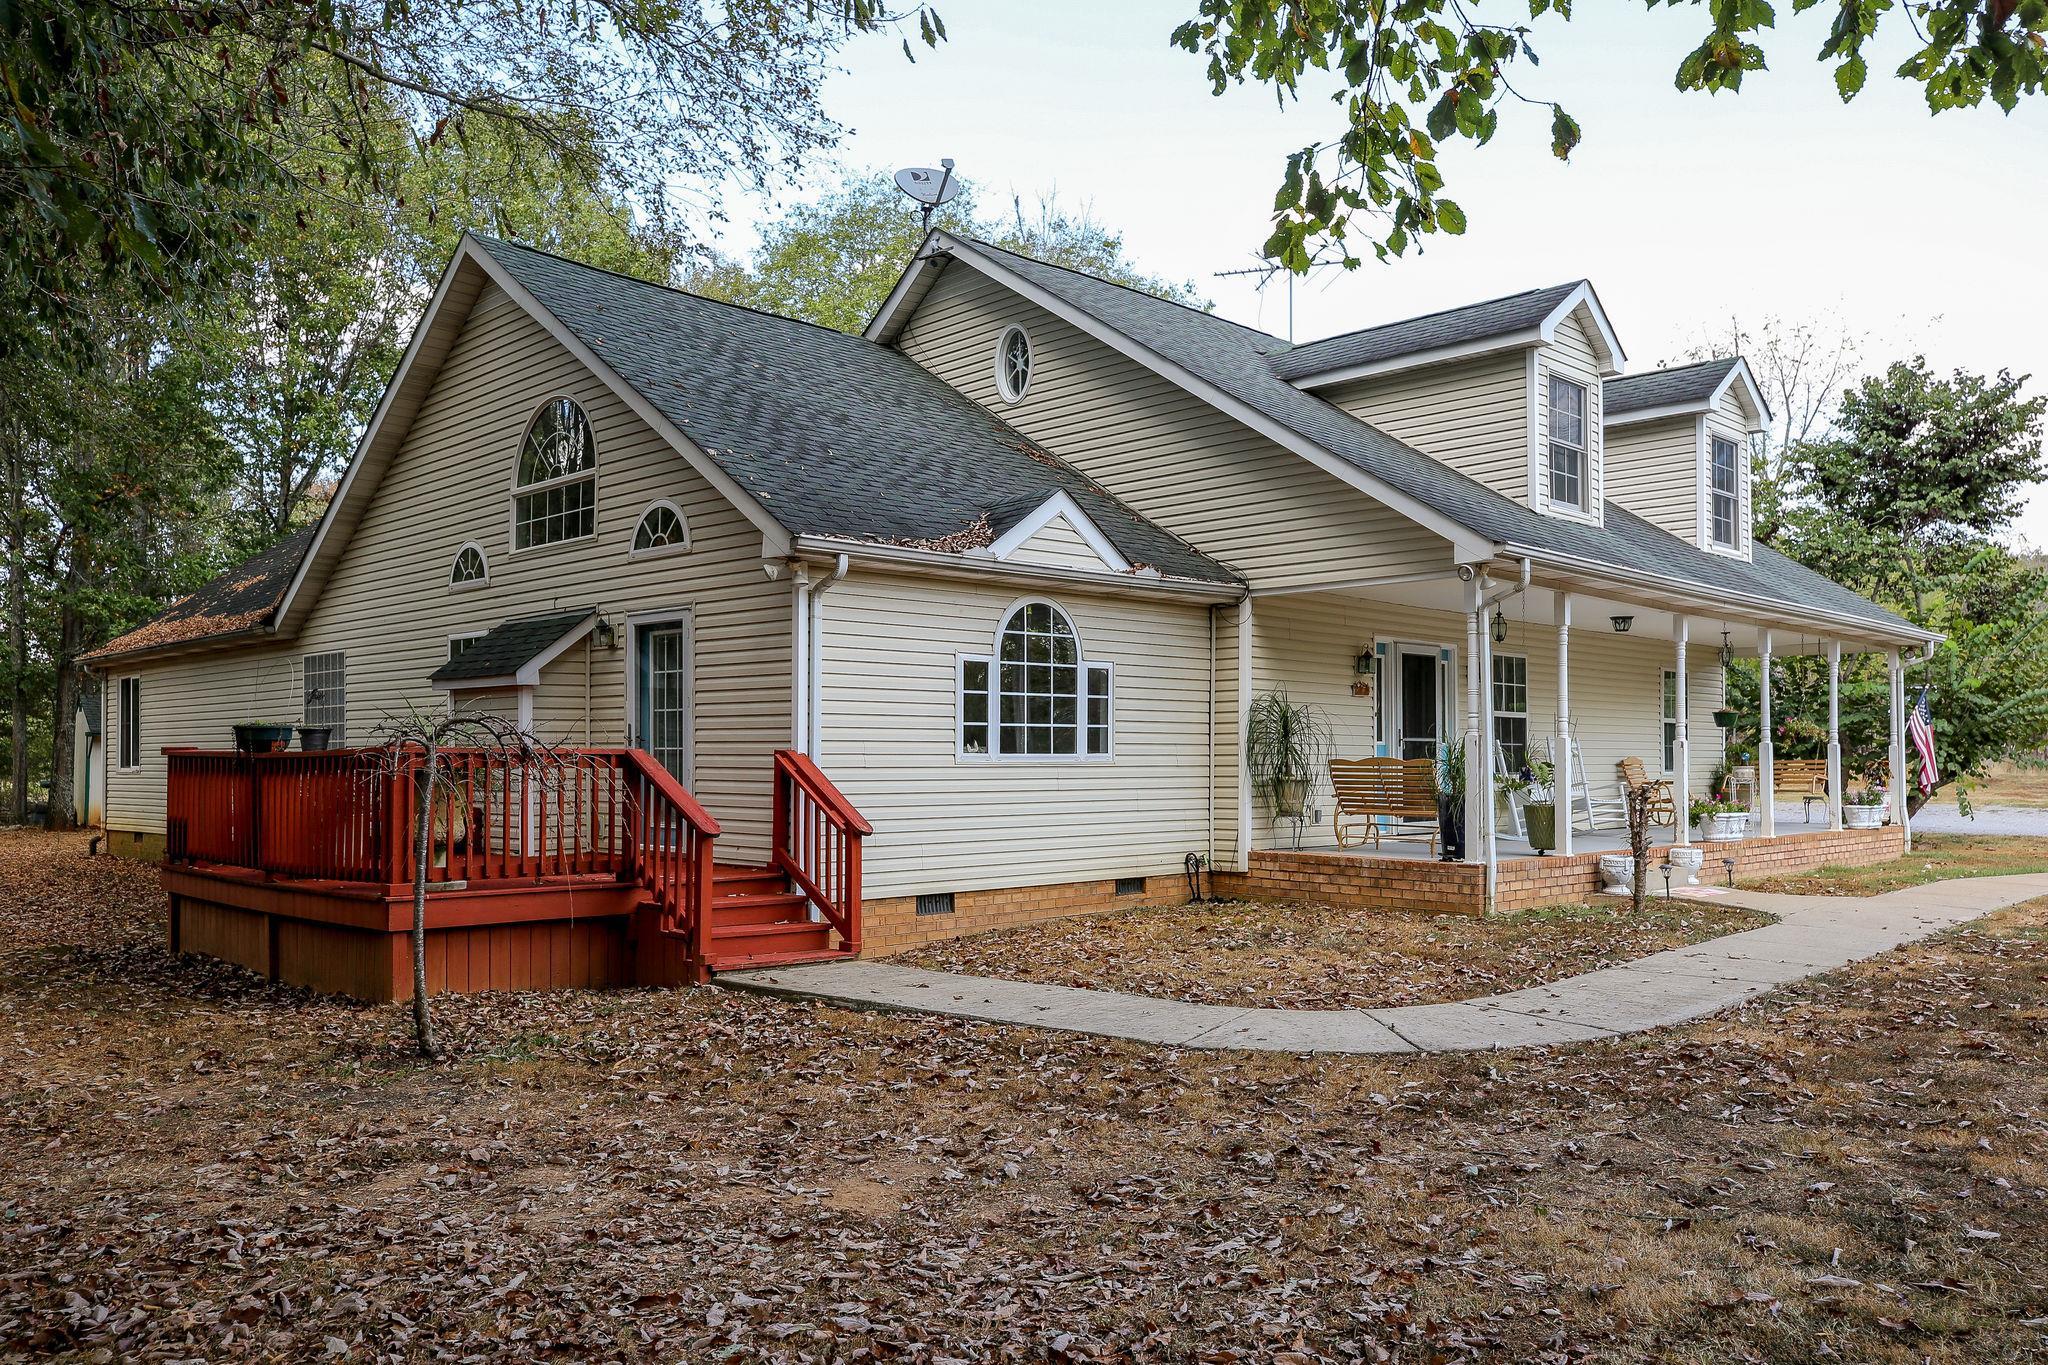 5307 Elam Rd, Murfreesboro, TN 37127 - Murfreesboro, TN real estate listing